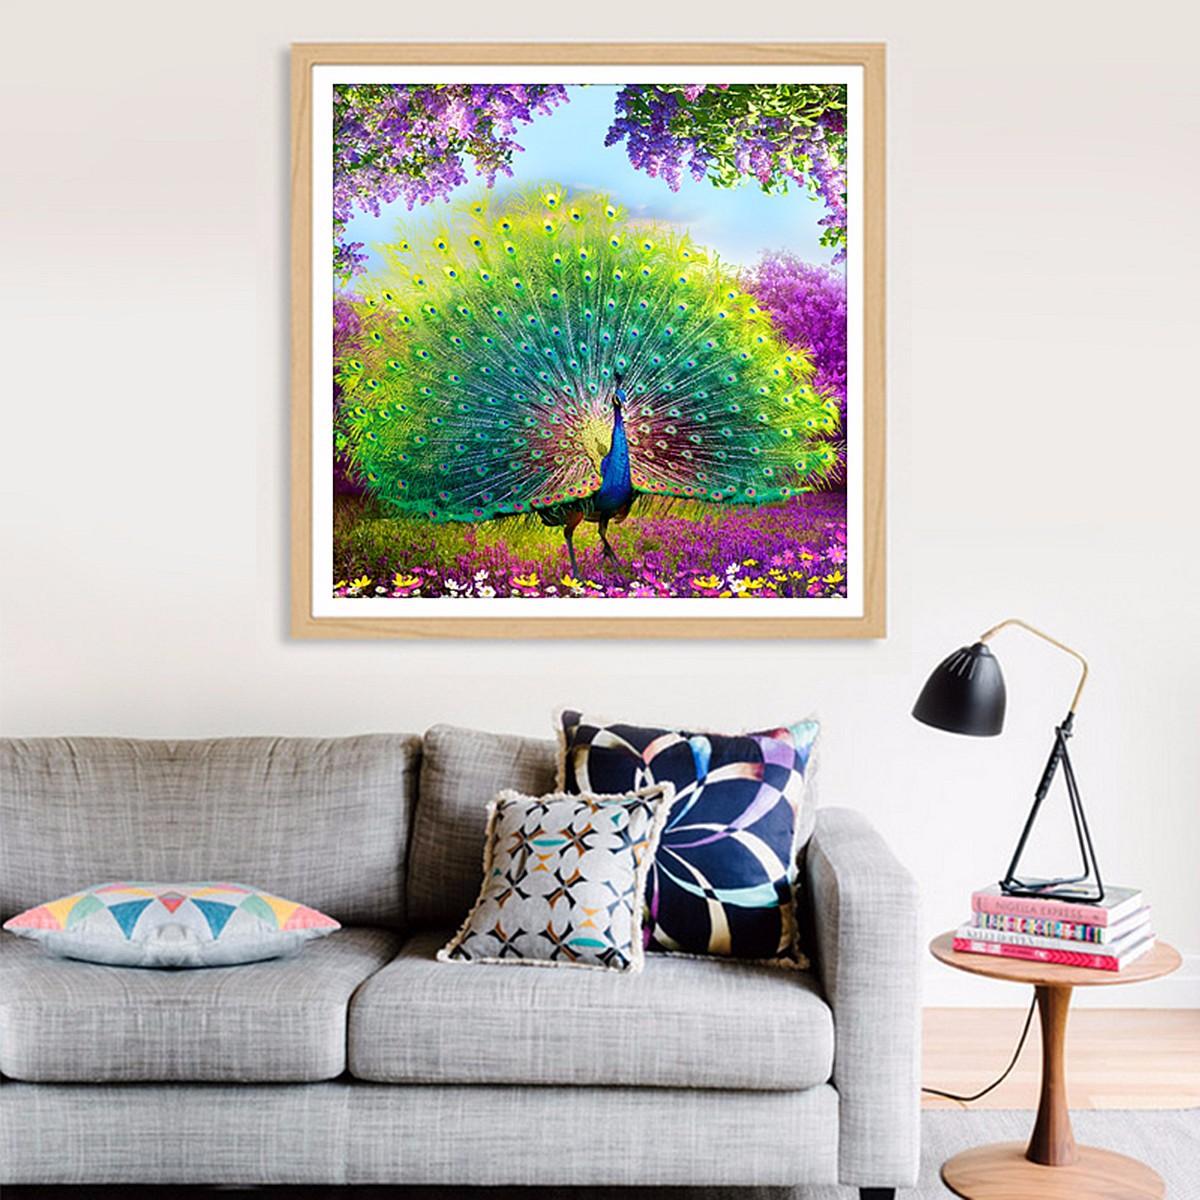 DIY 5D Diamond Embroidery Painting Flower Peacock Mosaic Cross Stitch Home Decor | Lazada Singapore